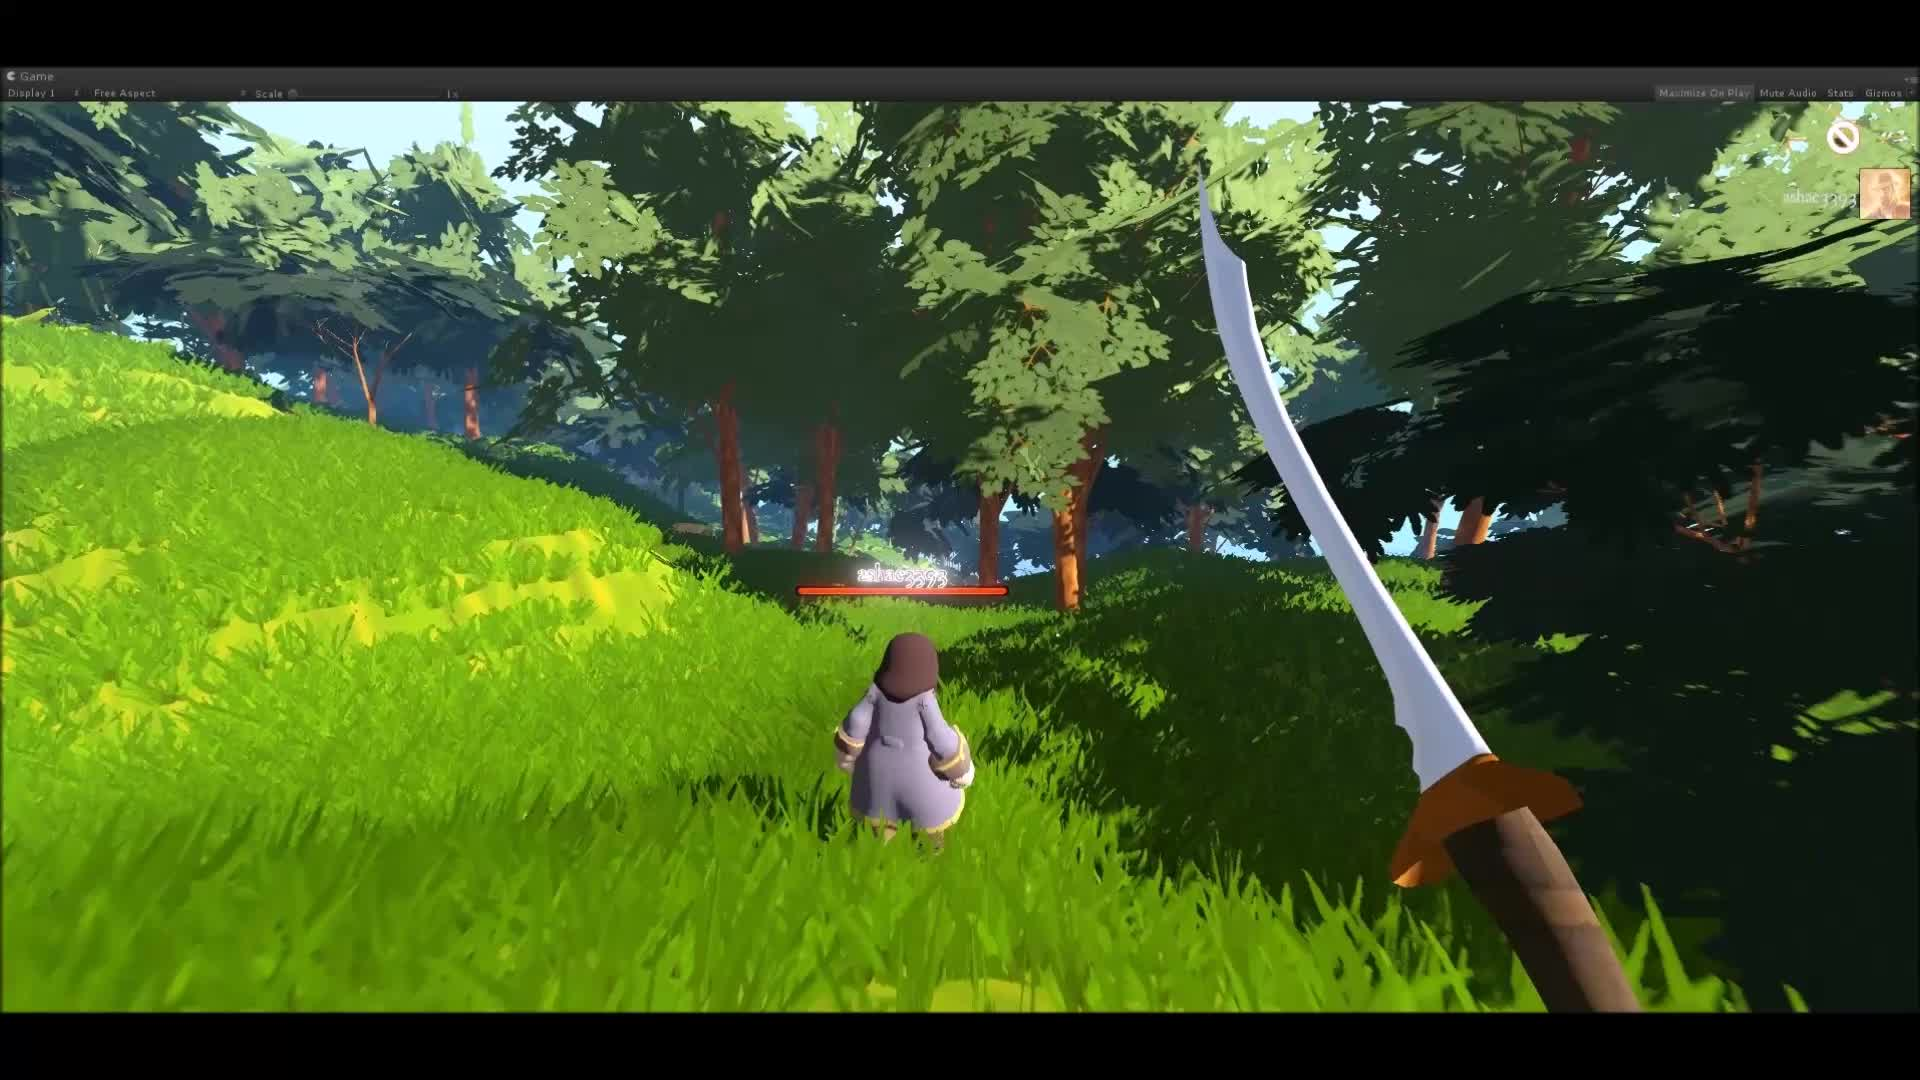 Multiplayer (Running) GIFs